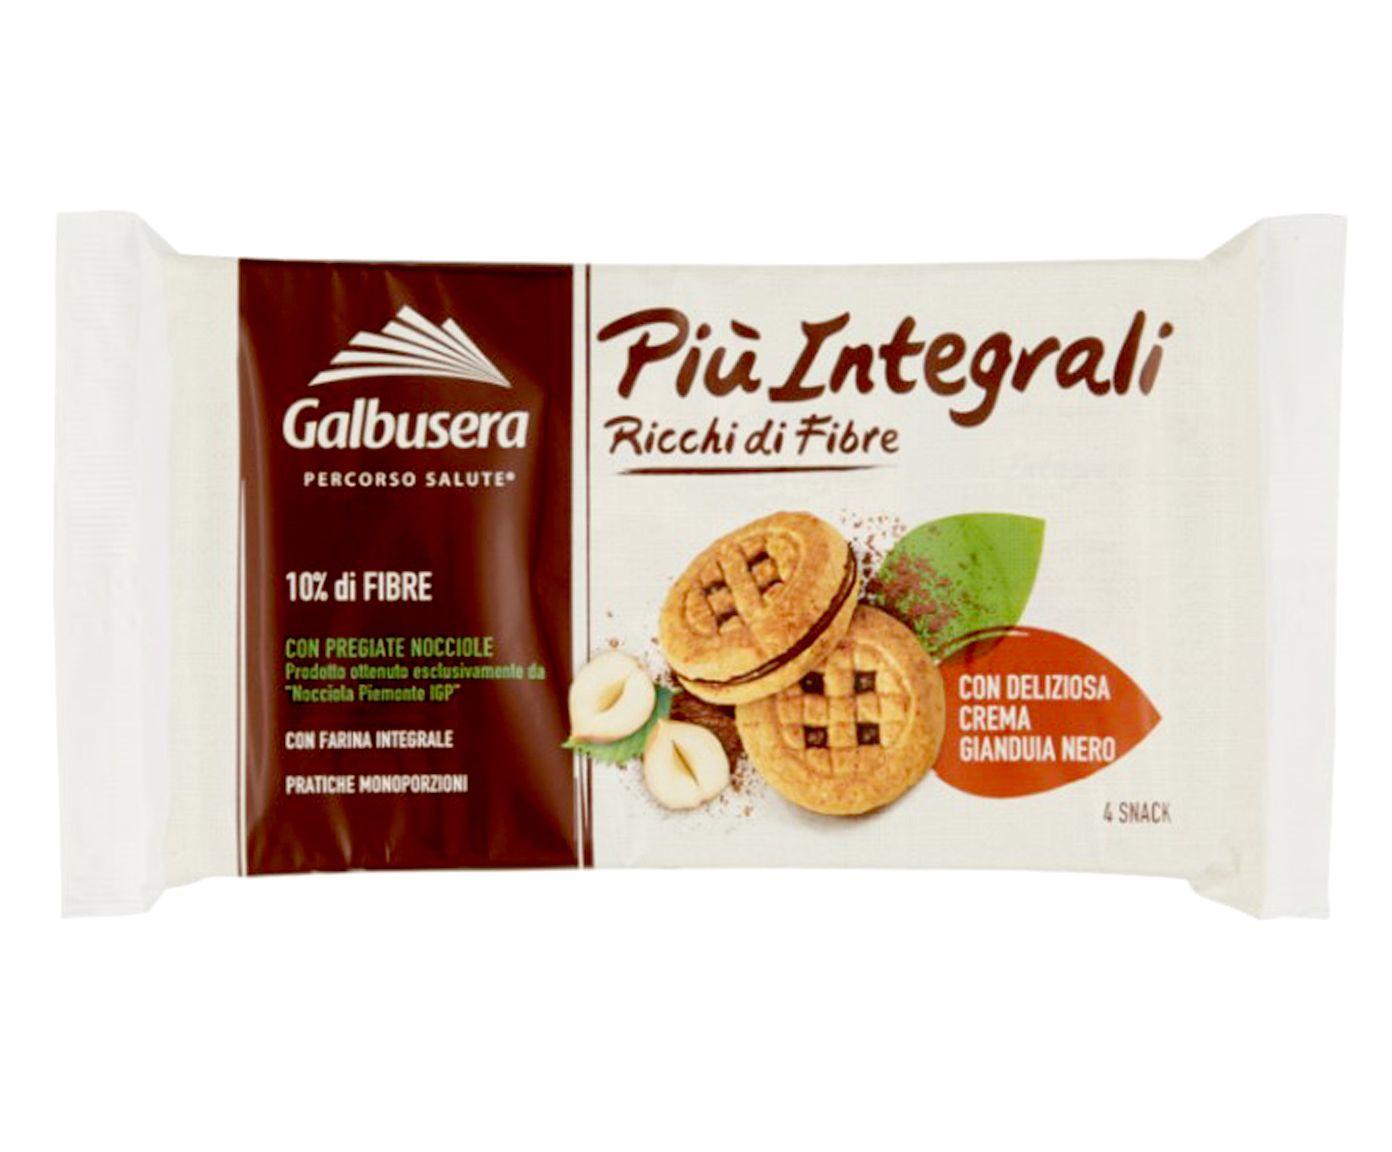 Biscoito Integral com Creme de Gianduia Piu Integrali - 160G | Westwing.com.br